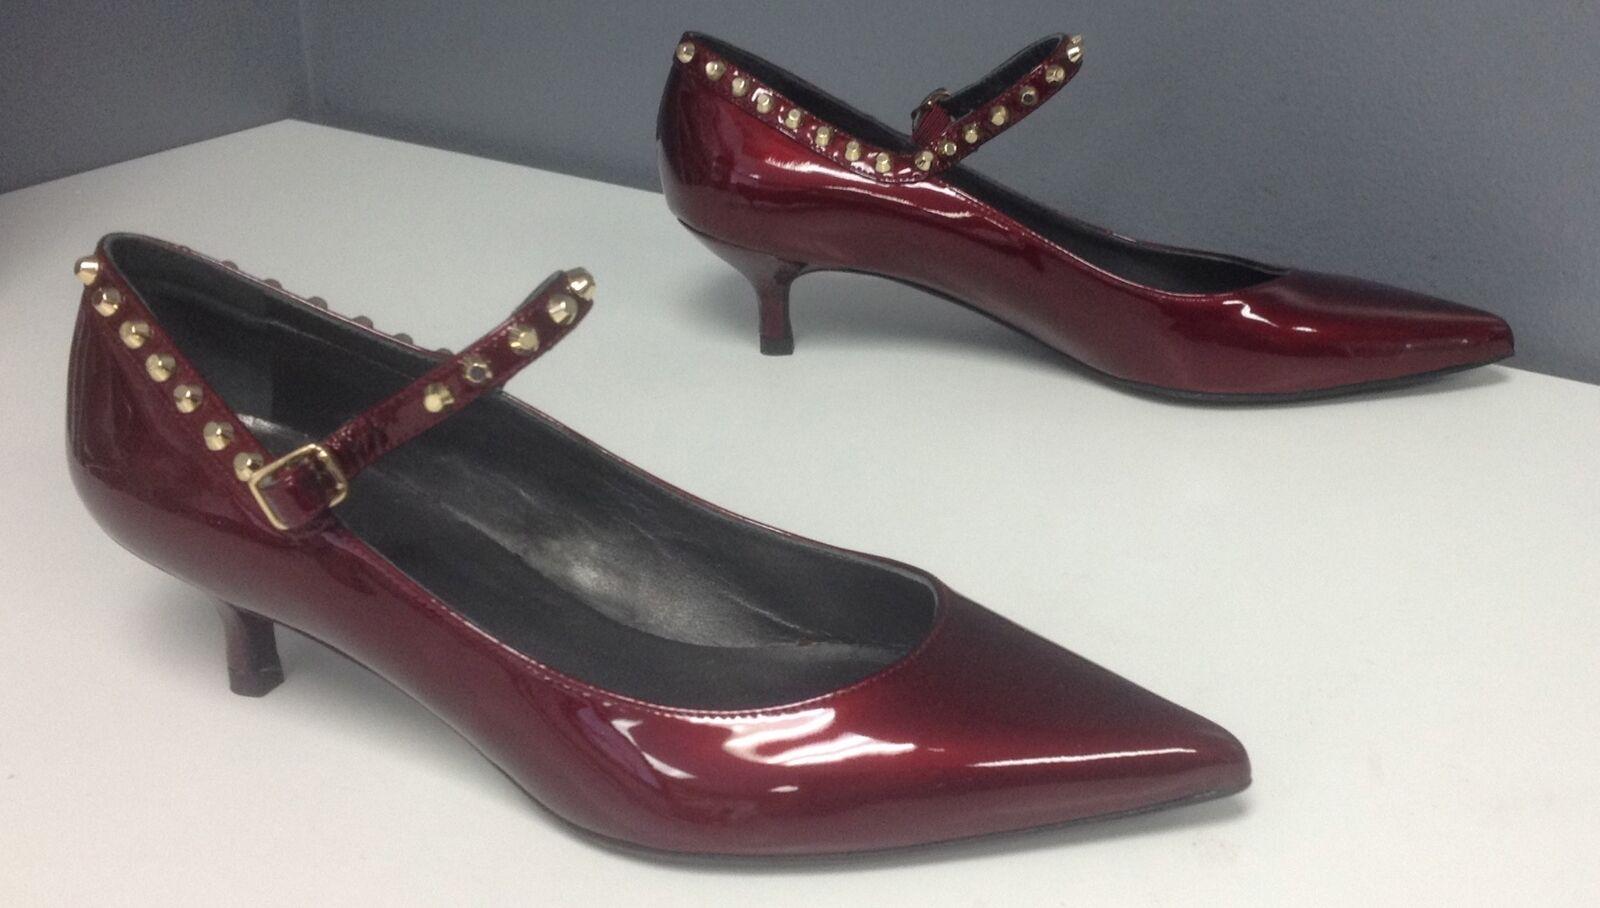 STUART WEITZMAN NWOB Red Patent Studded Kitten Heel Mary Janes Sz 38.5 B4697